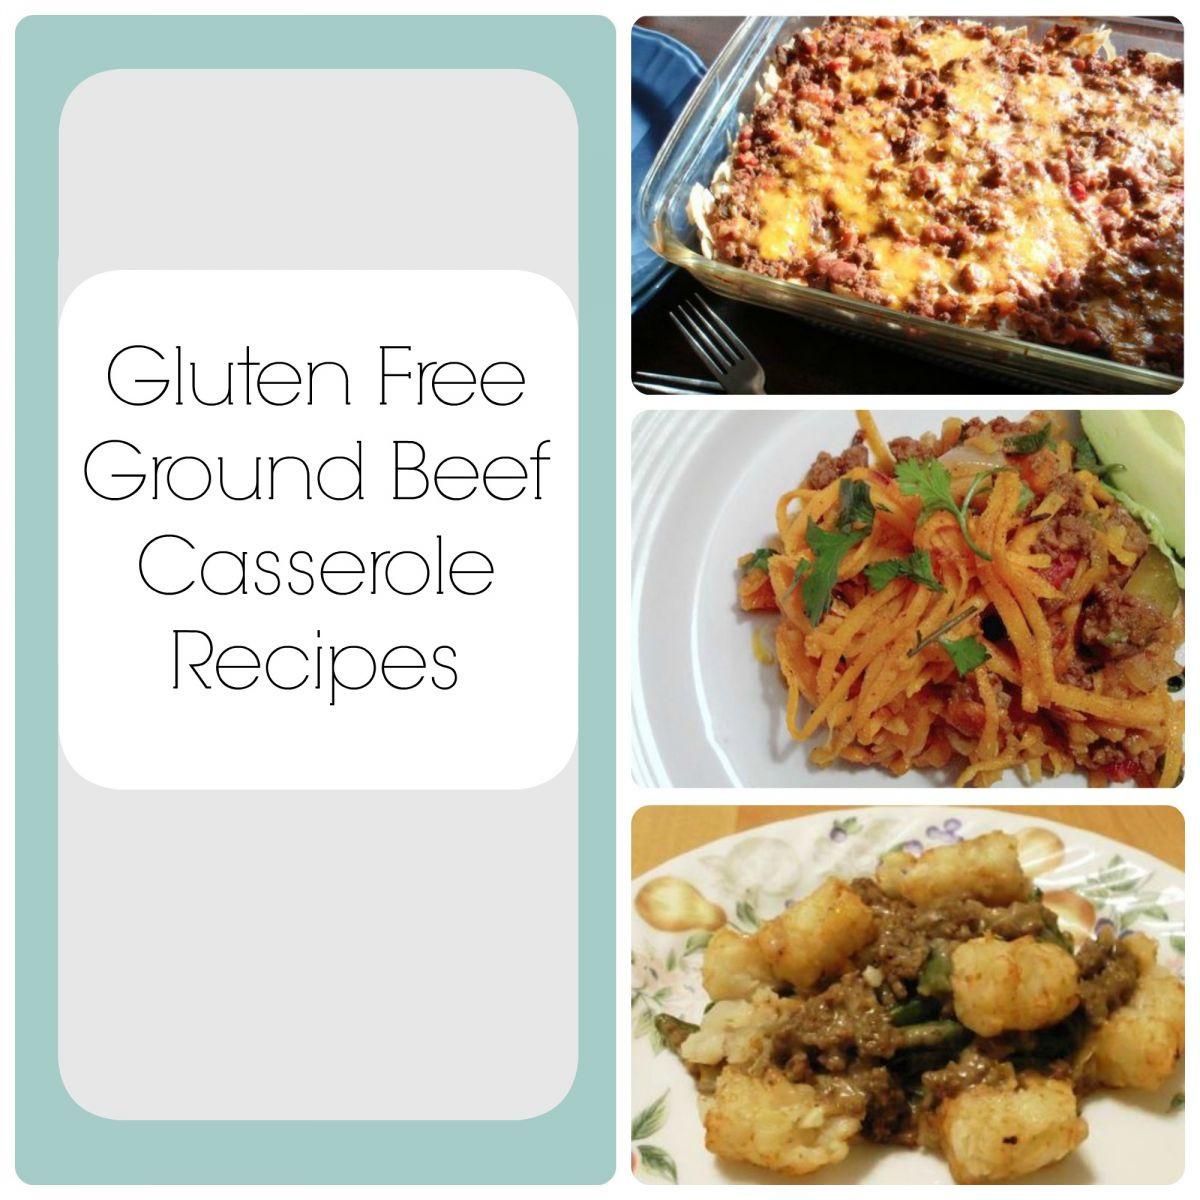 Gluten Free Casserole Recipes  ly the Best Gluten Free Recipes 8 Ground Beef Casserole